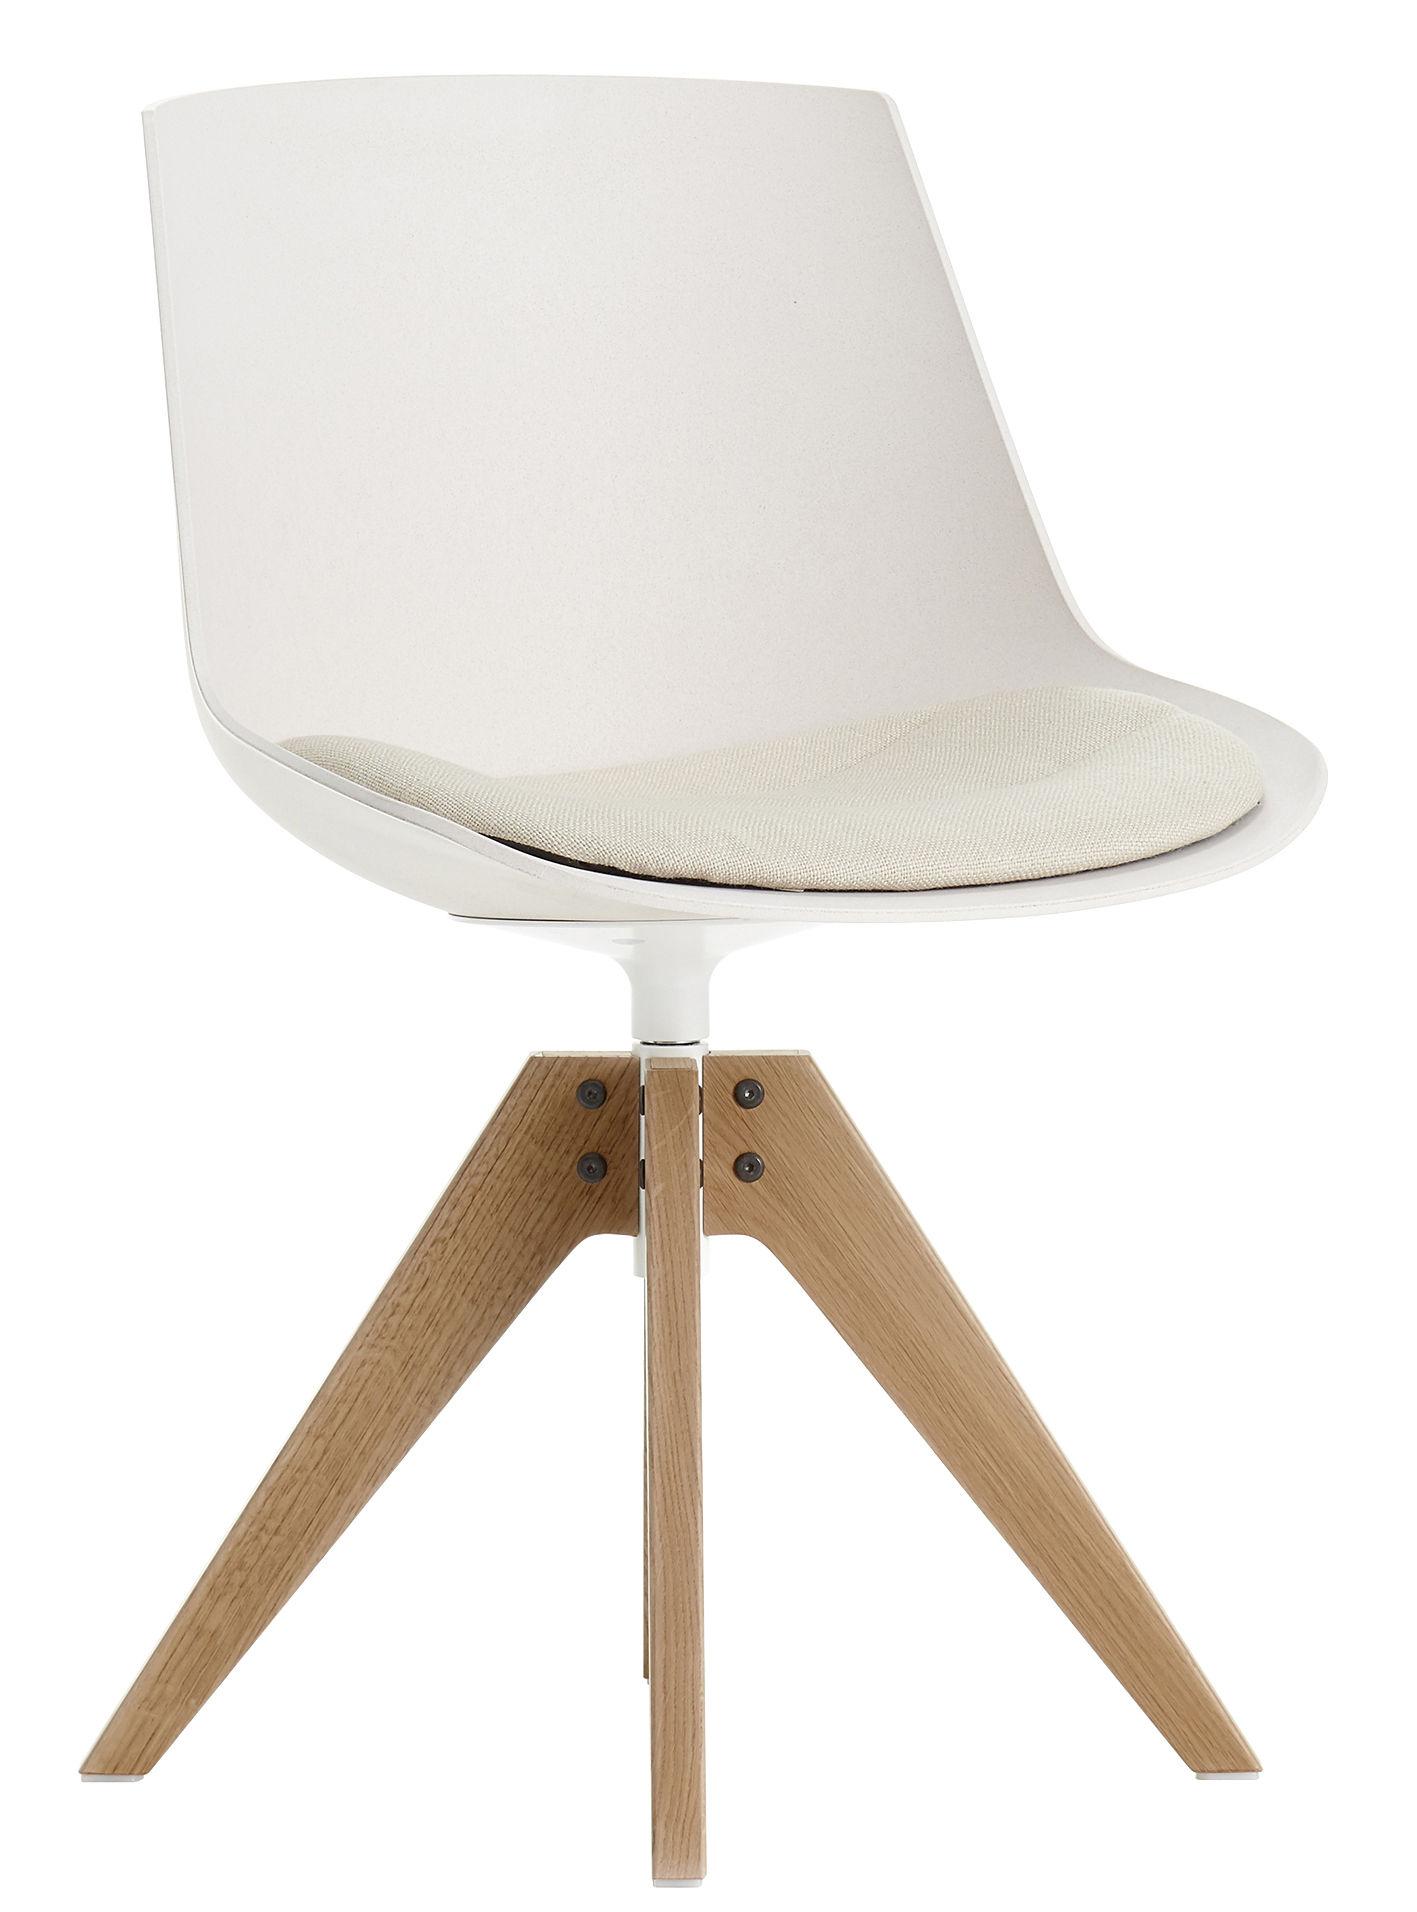 swivel chair feet tub fabric accent patchwork flow eco by mdf italia white light oak l 56 x seat cushion 4 vn